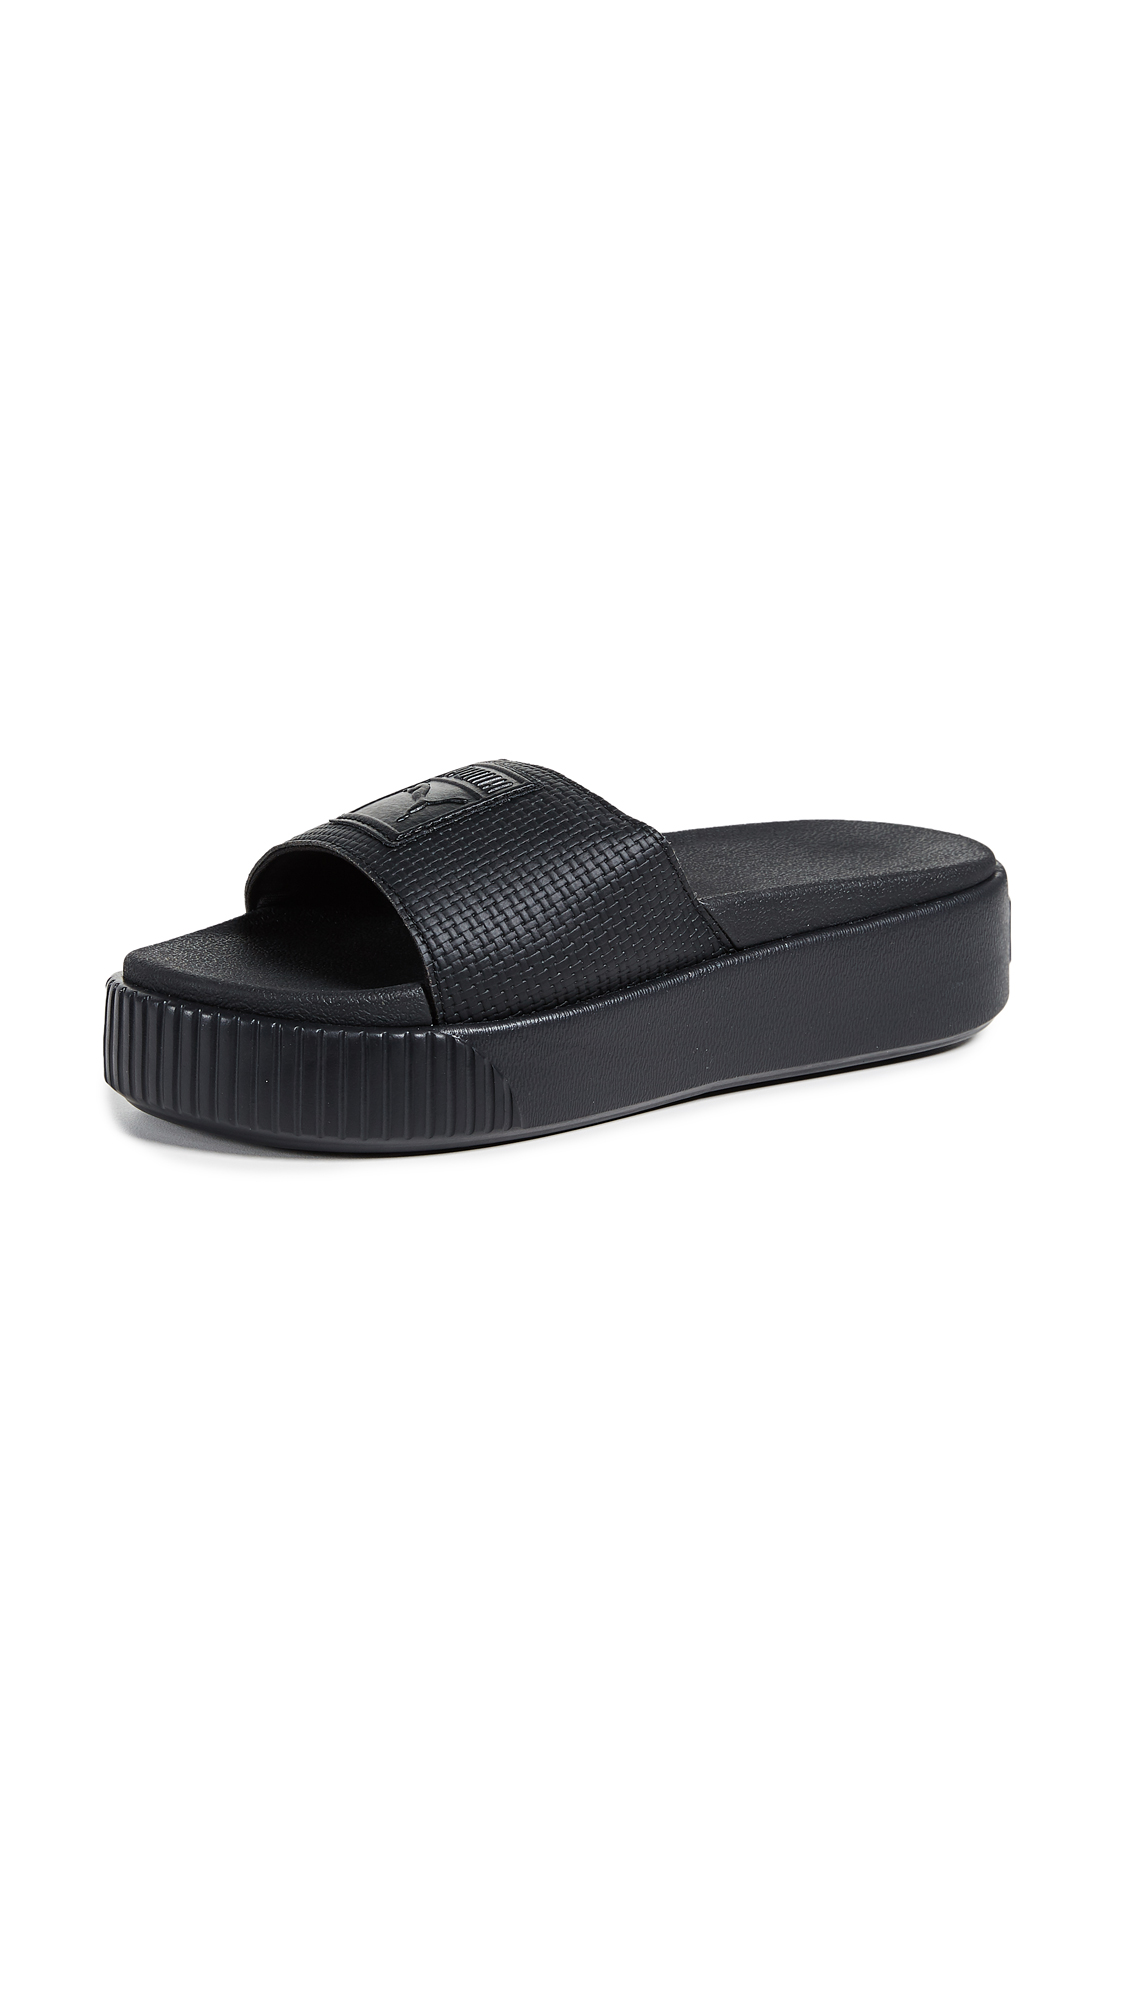 Platform Bold Slides, Puma Black/Puma Black